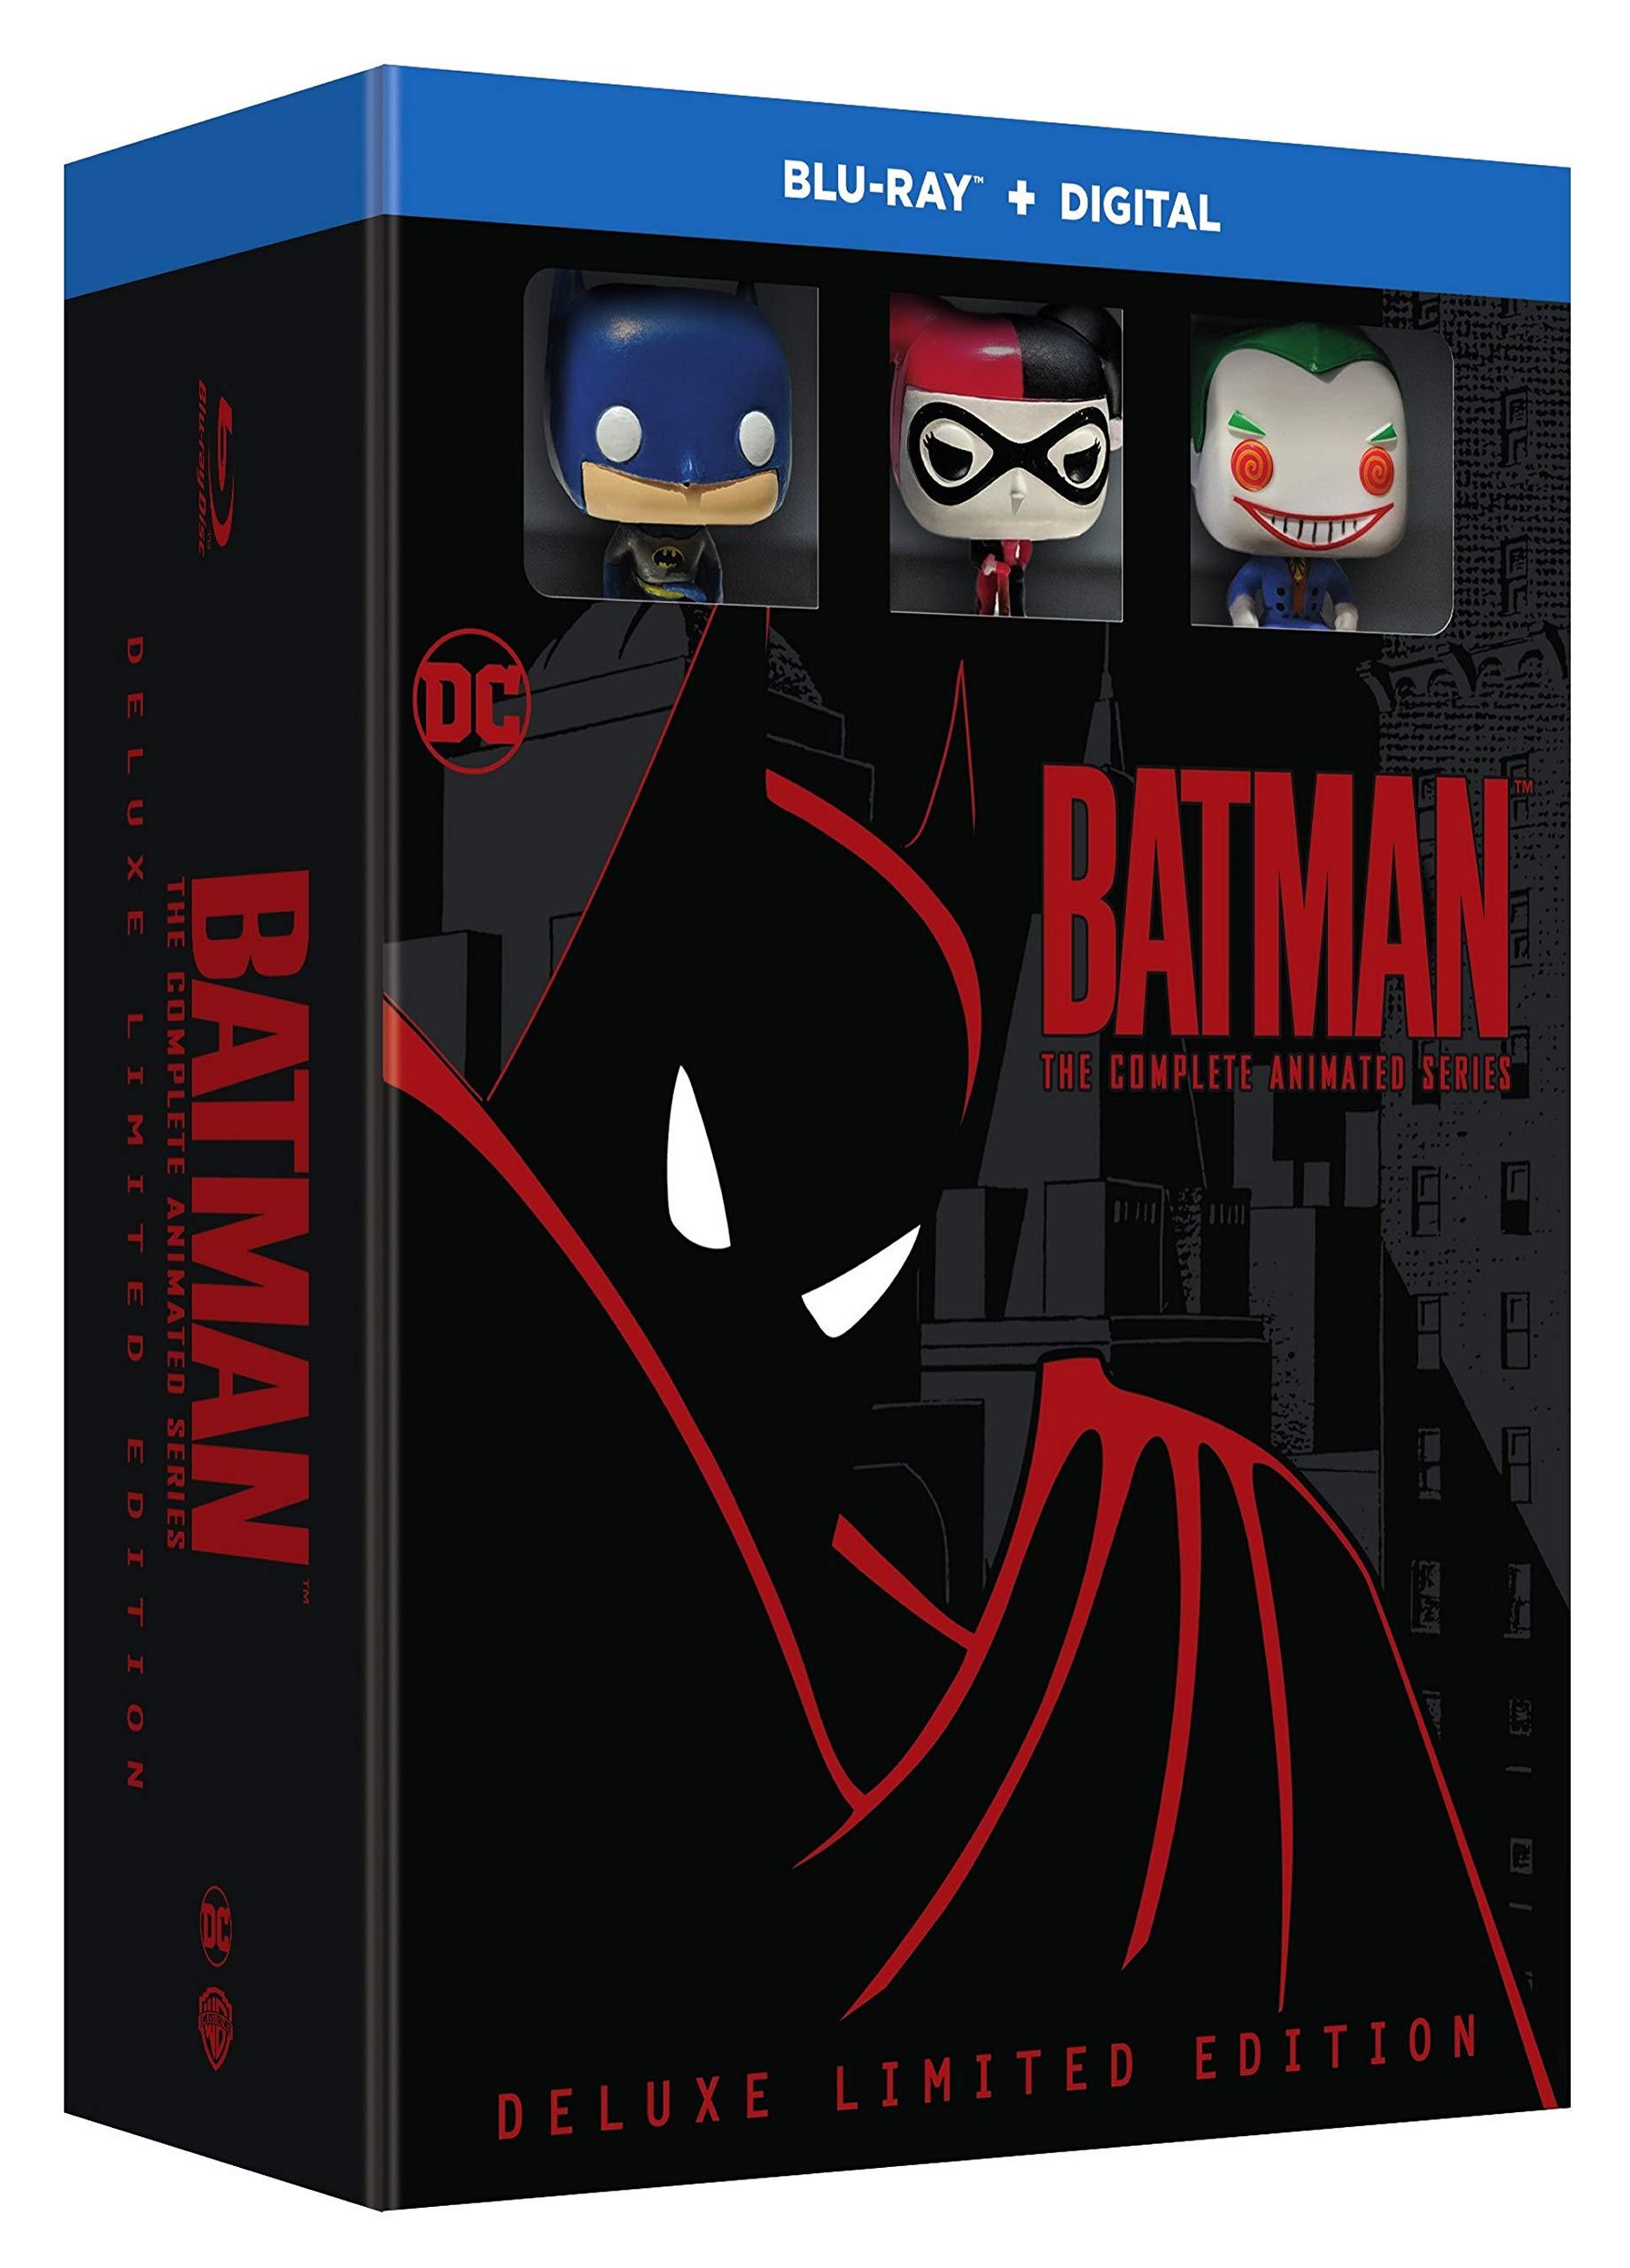 Buy Batman Animated Series Now!